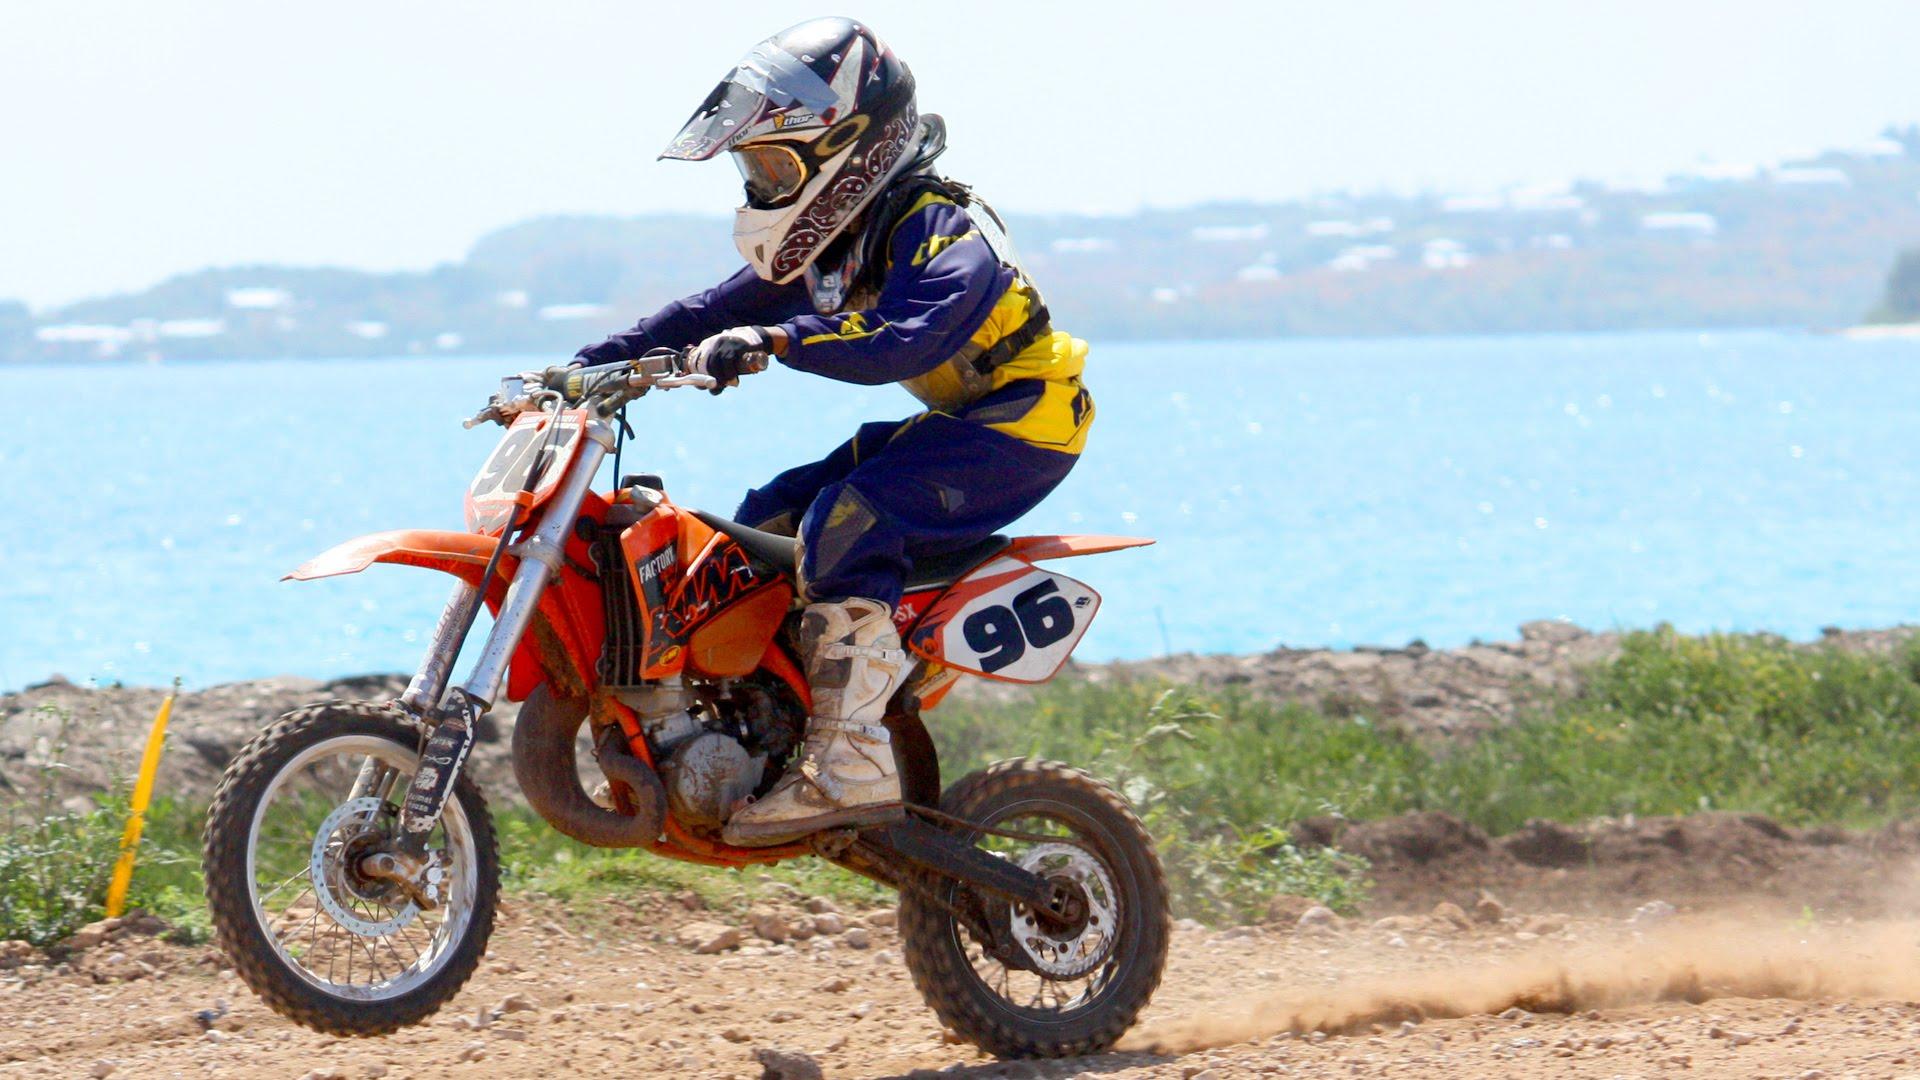 moto cross 65cc